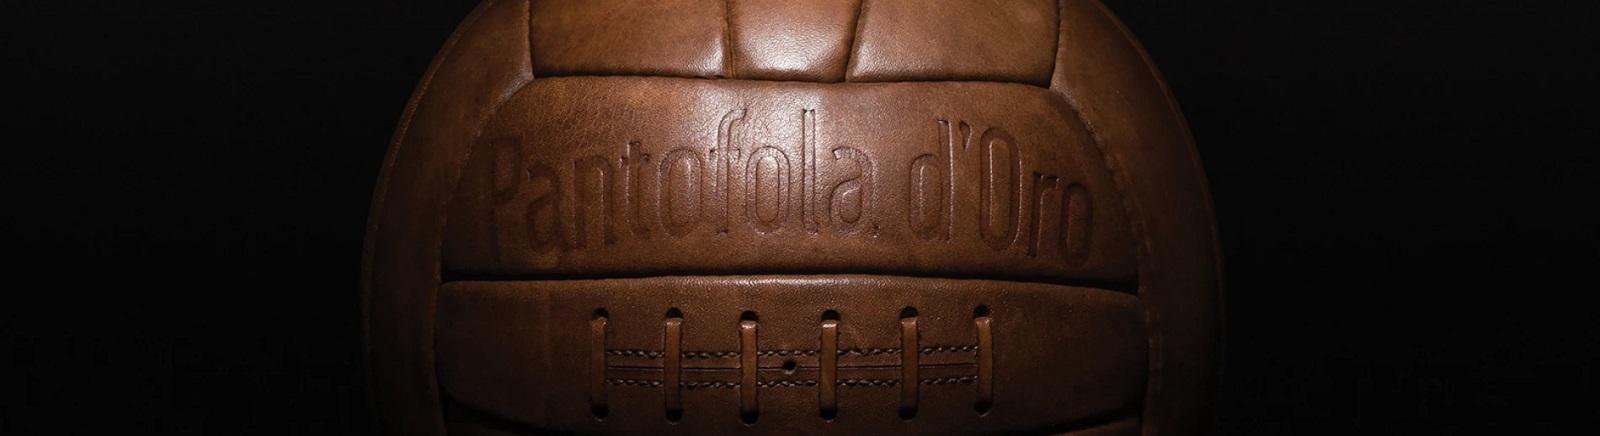 Pantofola d'Oro Herrenschuhe online entdecken im Juppen Shop